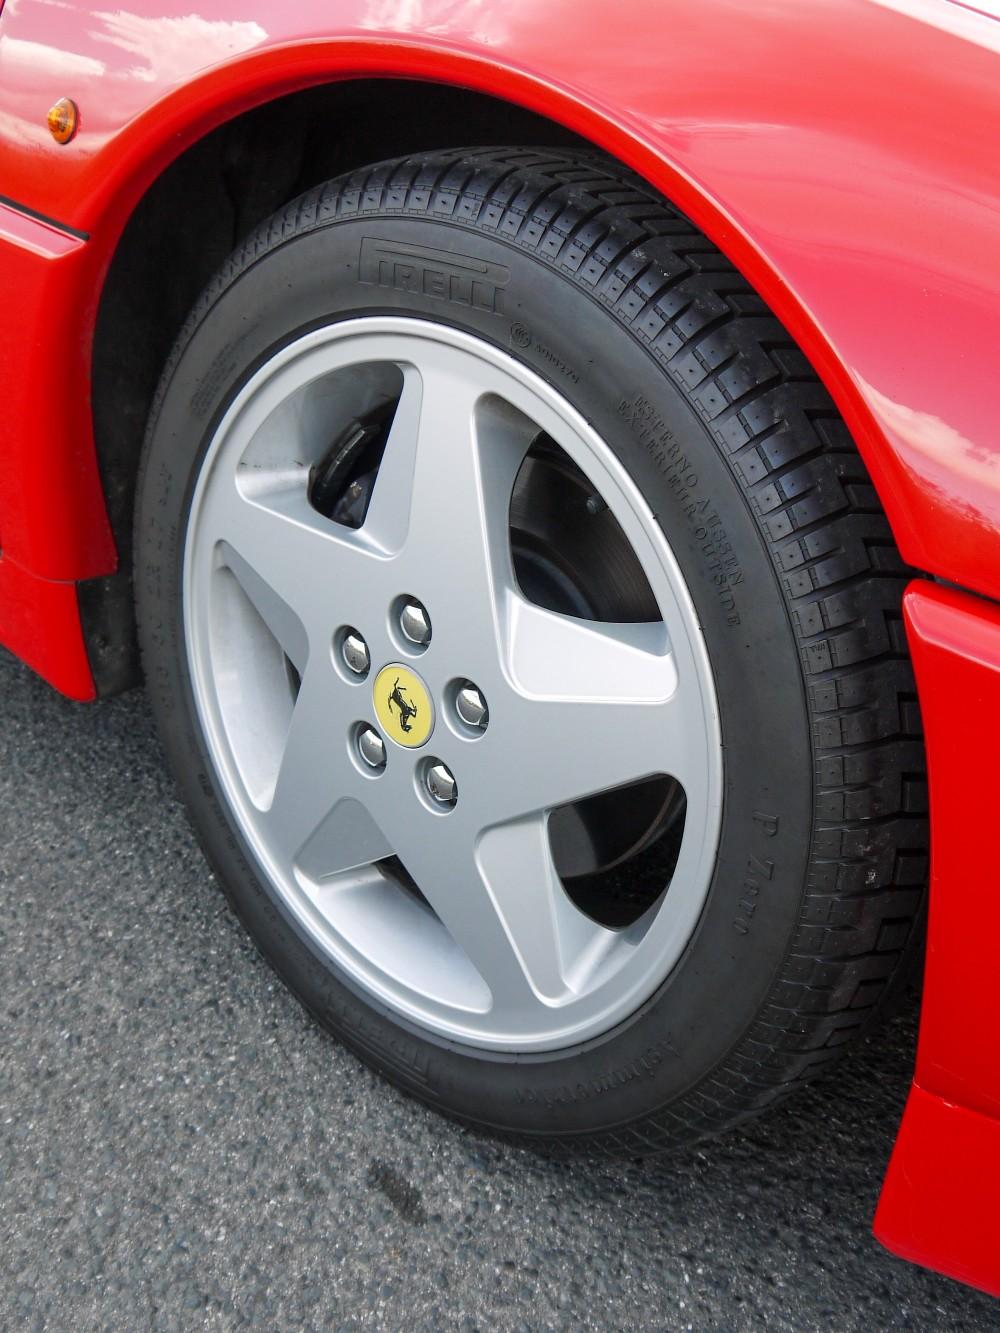 1993 FERRARI 348 TRASVERSALE BERLINETTA Registration Number: L796THC Chassis Number: - Image 18 of 49